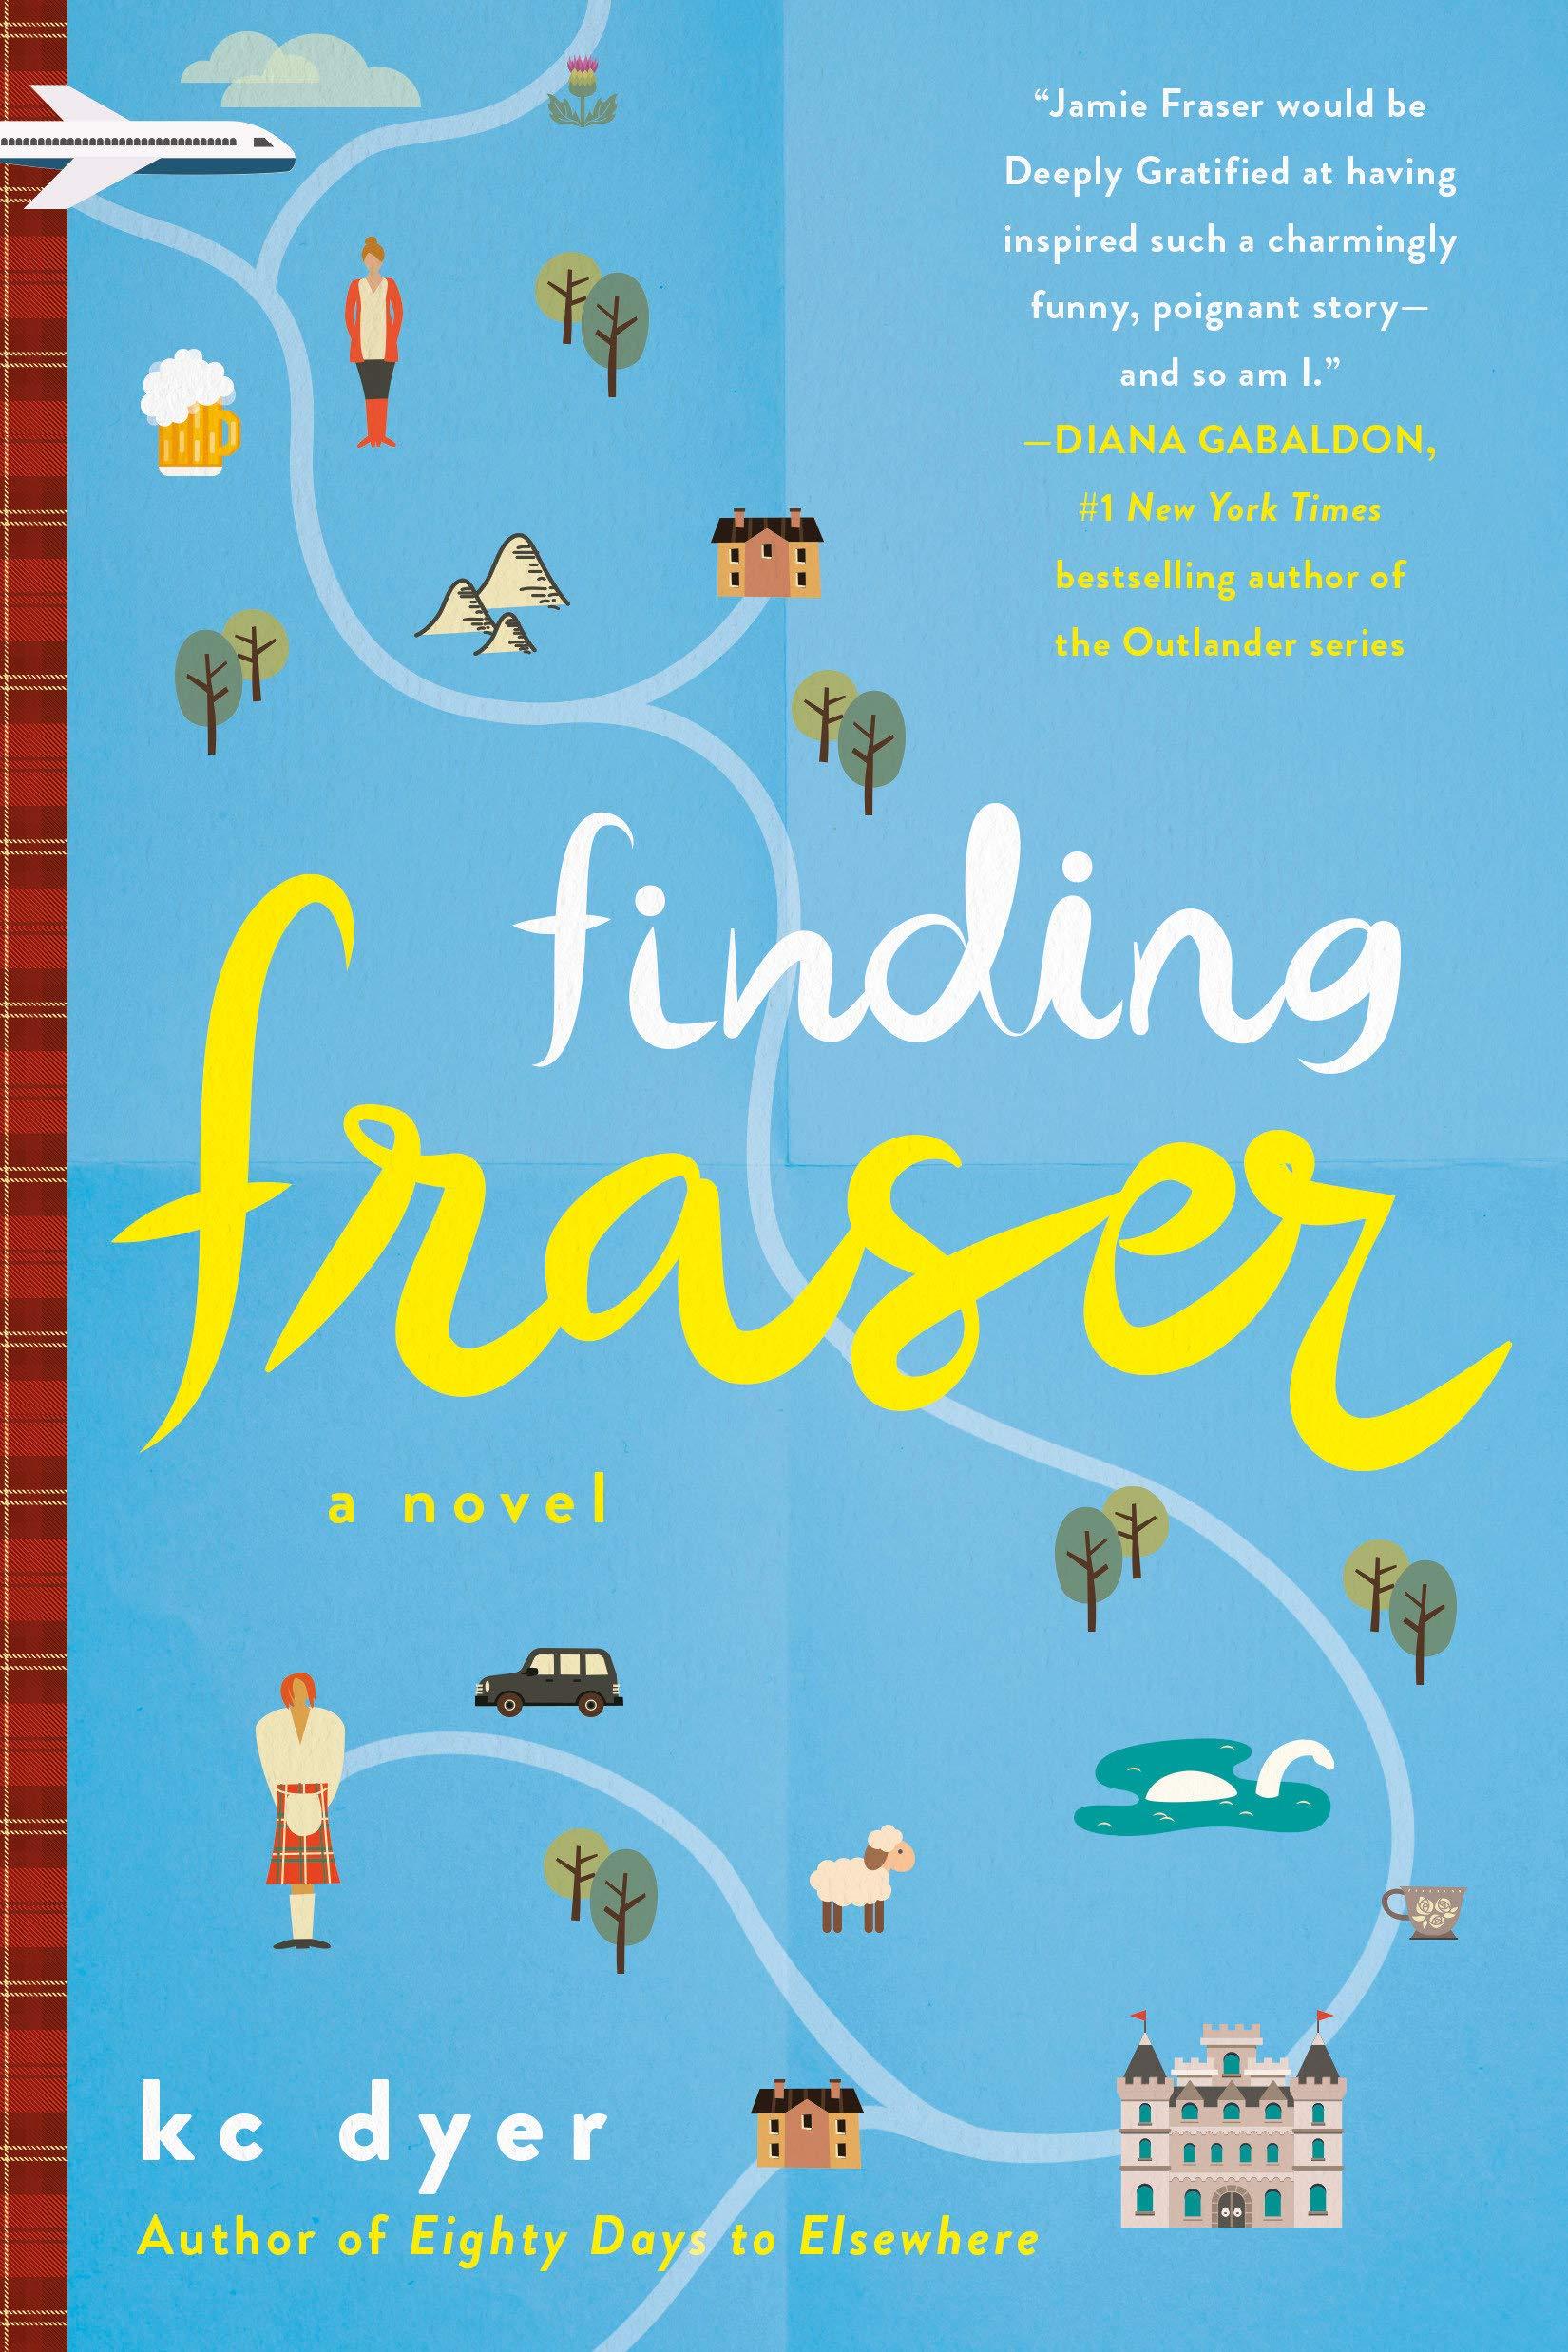 Finding Fraser Amazon.de dyer, kc Fremdsprachige Bücher